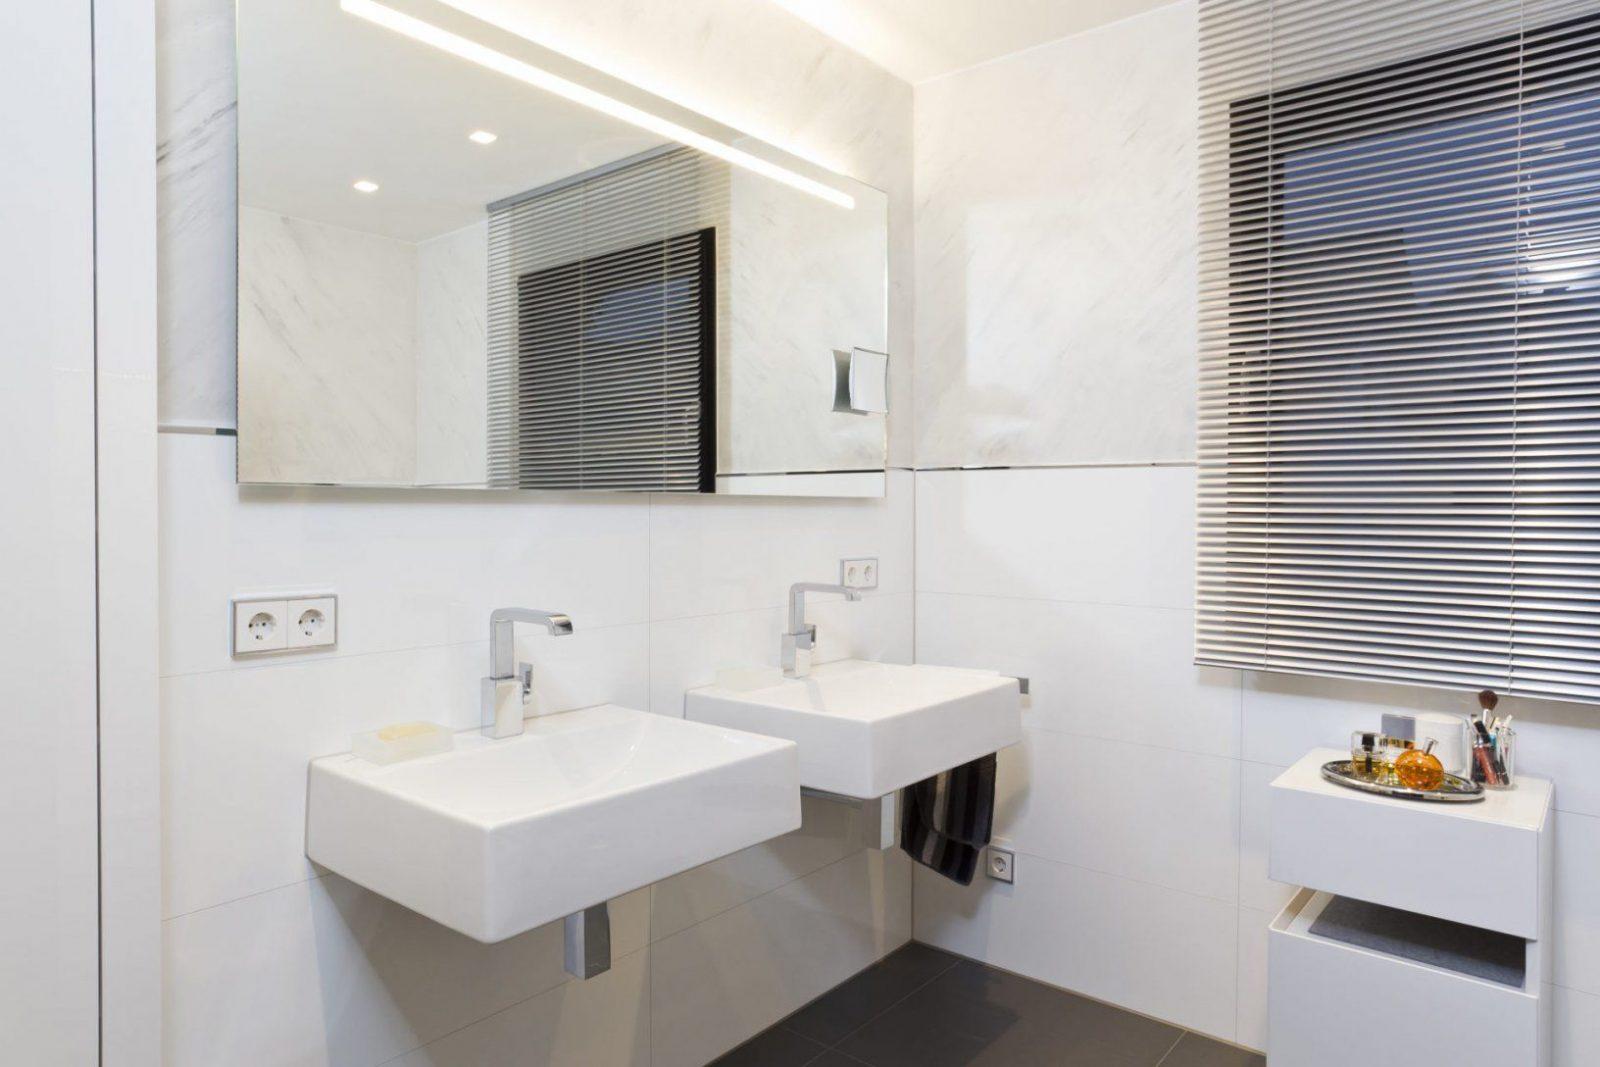 traumbadezimmer ganz in weiss wow pinterest badezimmer 20 great traum badezimmer images. Black Bedroom Furniture Sets. Home Design Ideas